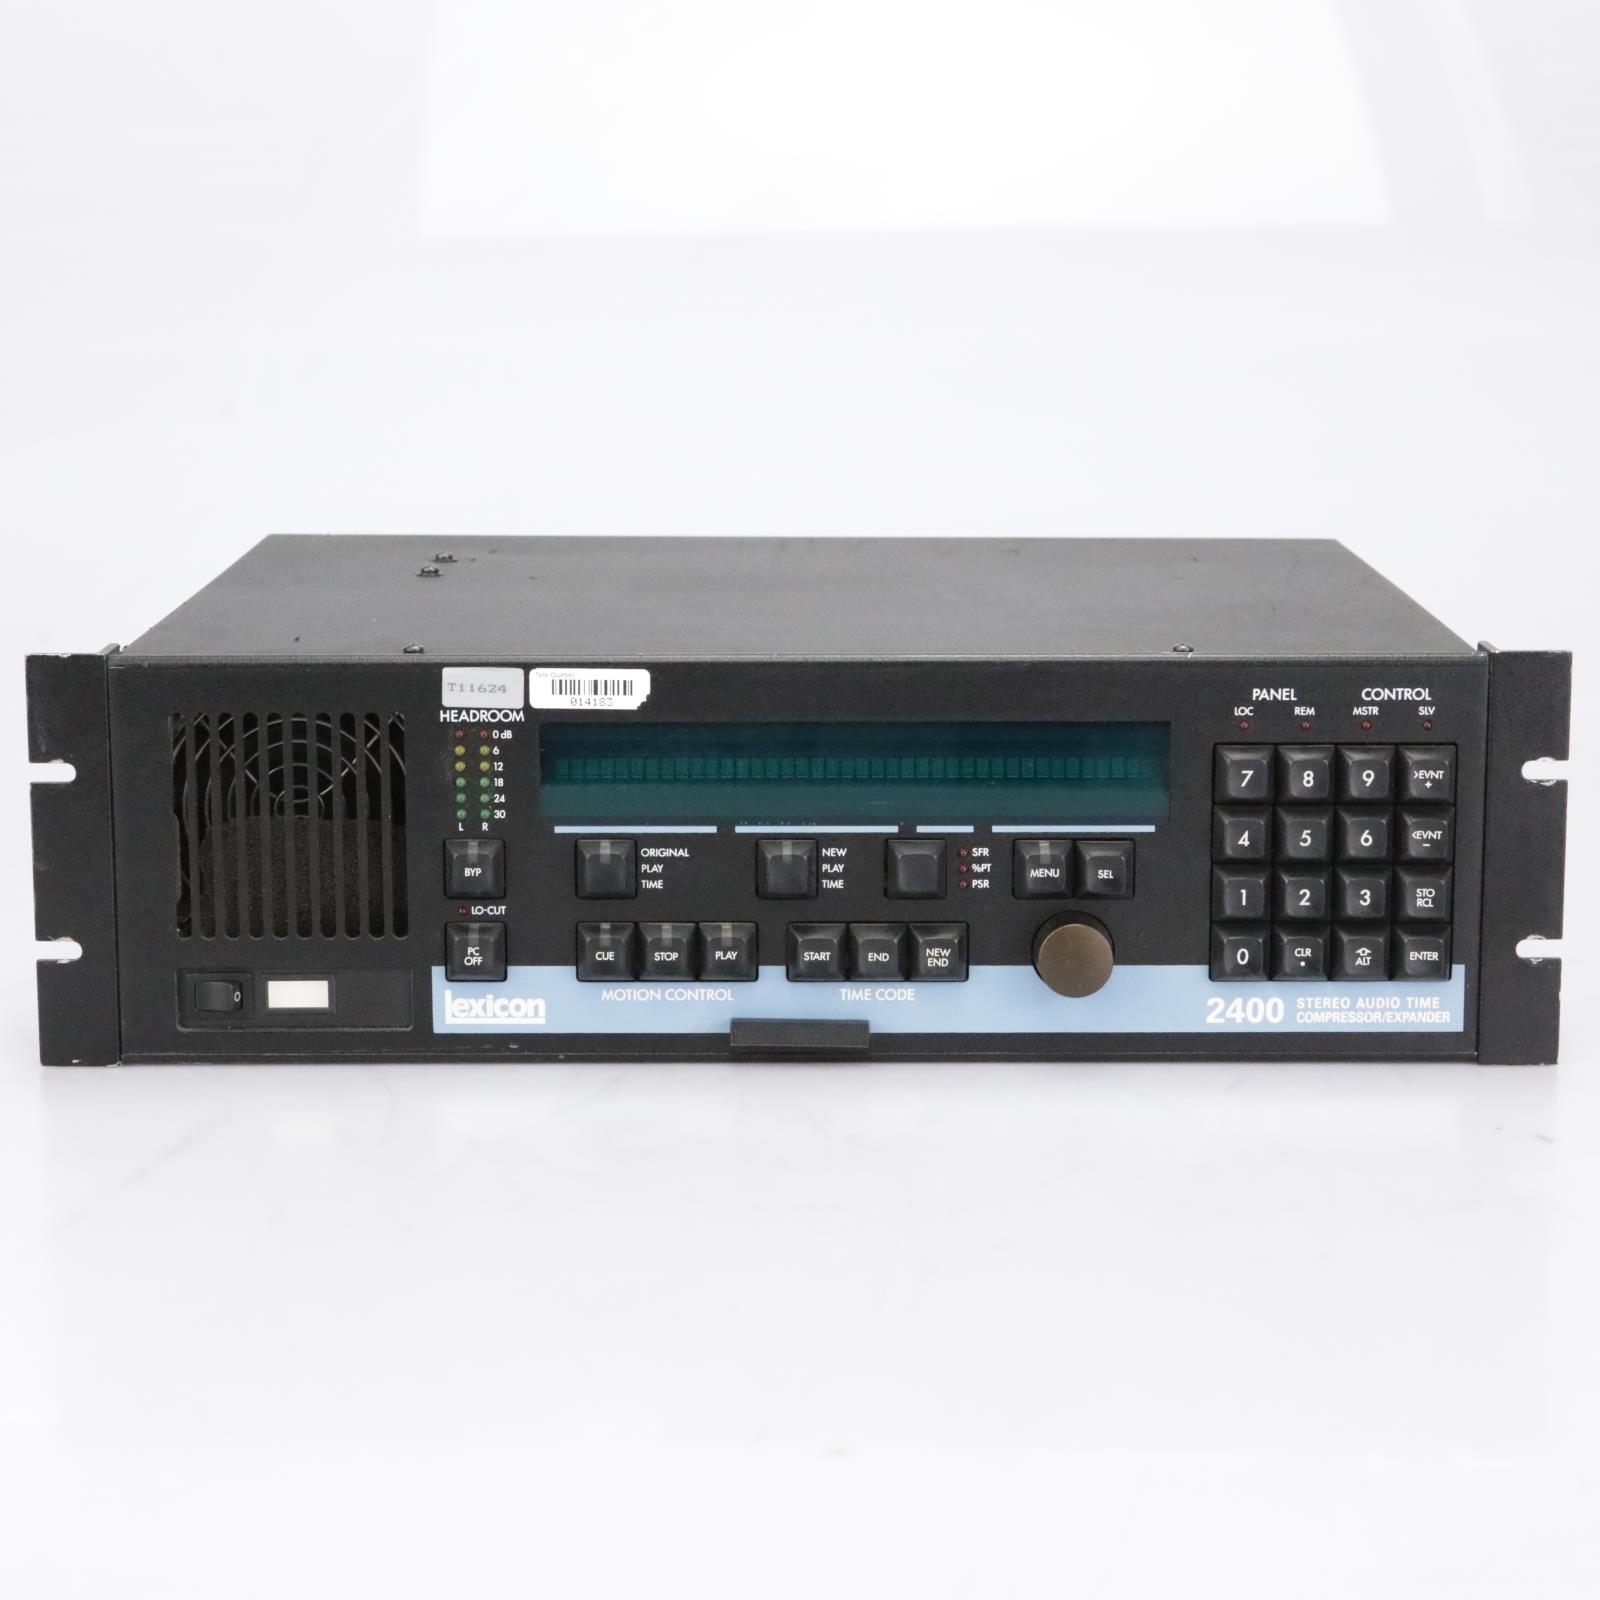 Lexicon 2400 Stereo Audio Time Compressor / Expander #42179